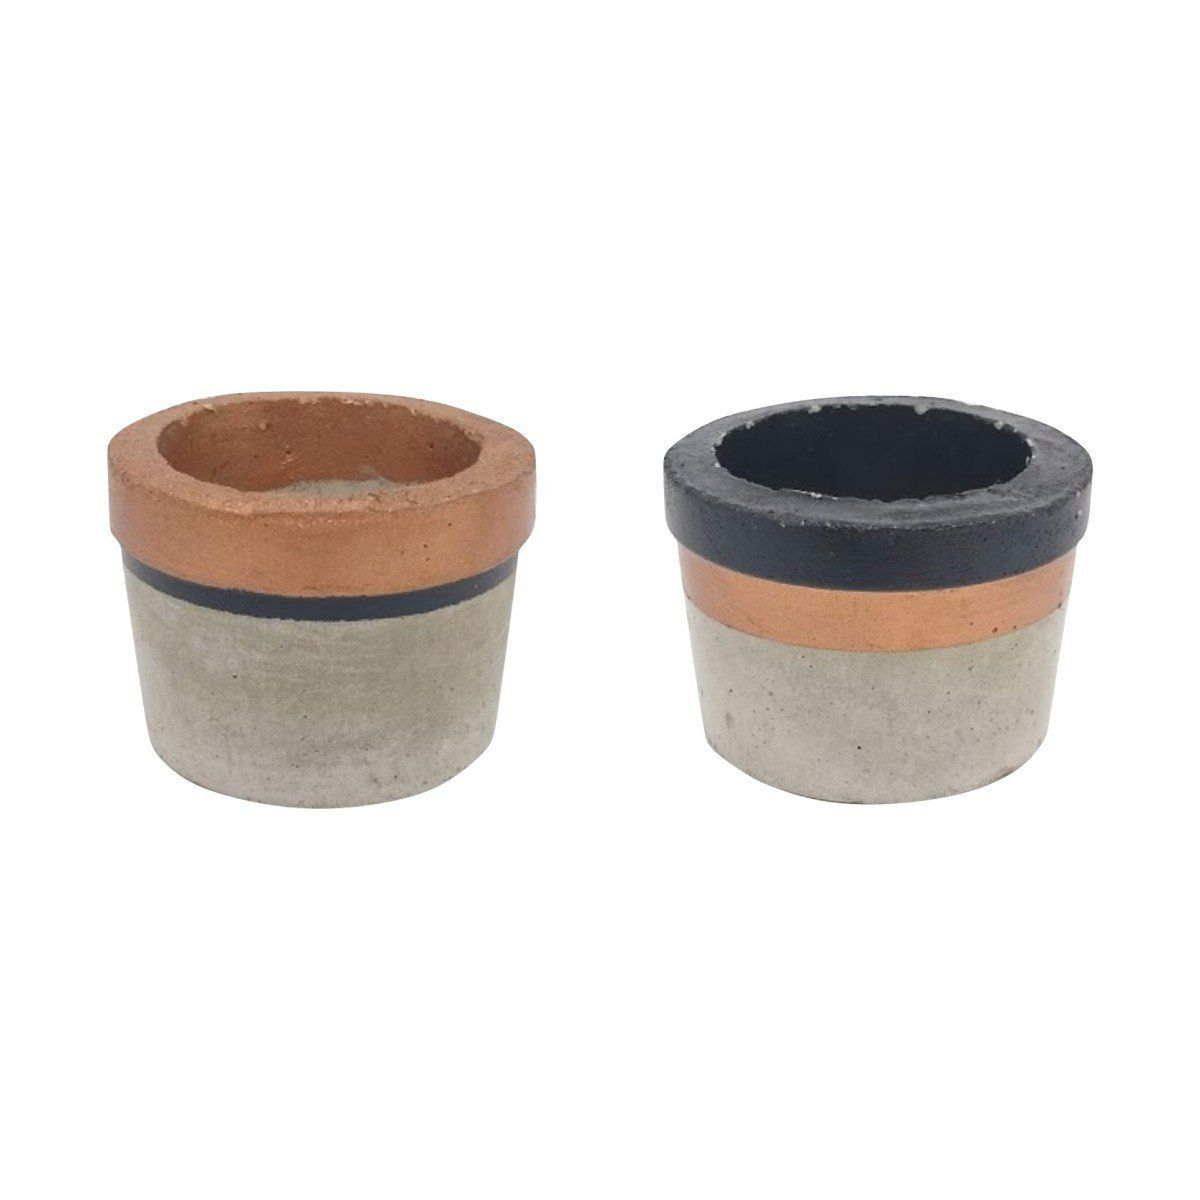 Kit 2 vasos de cimento 5cm x 6,5cm MD1717CPPC